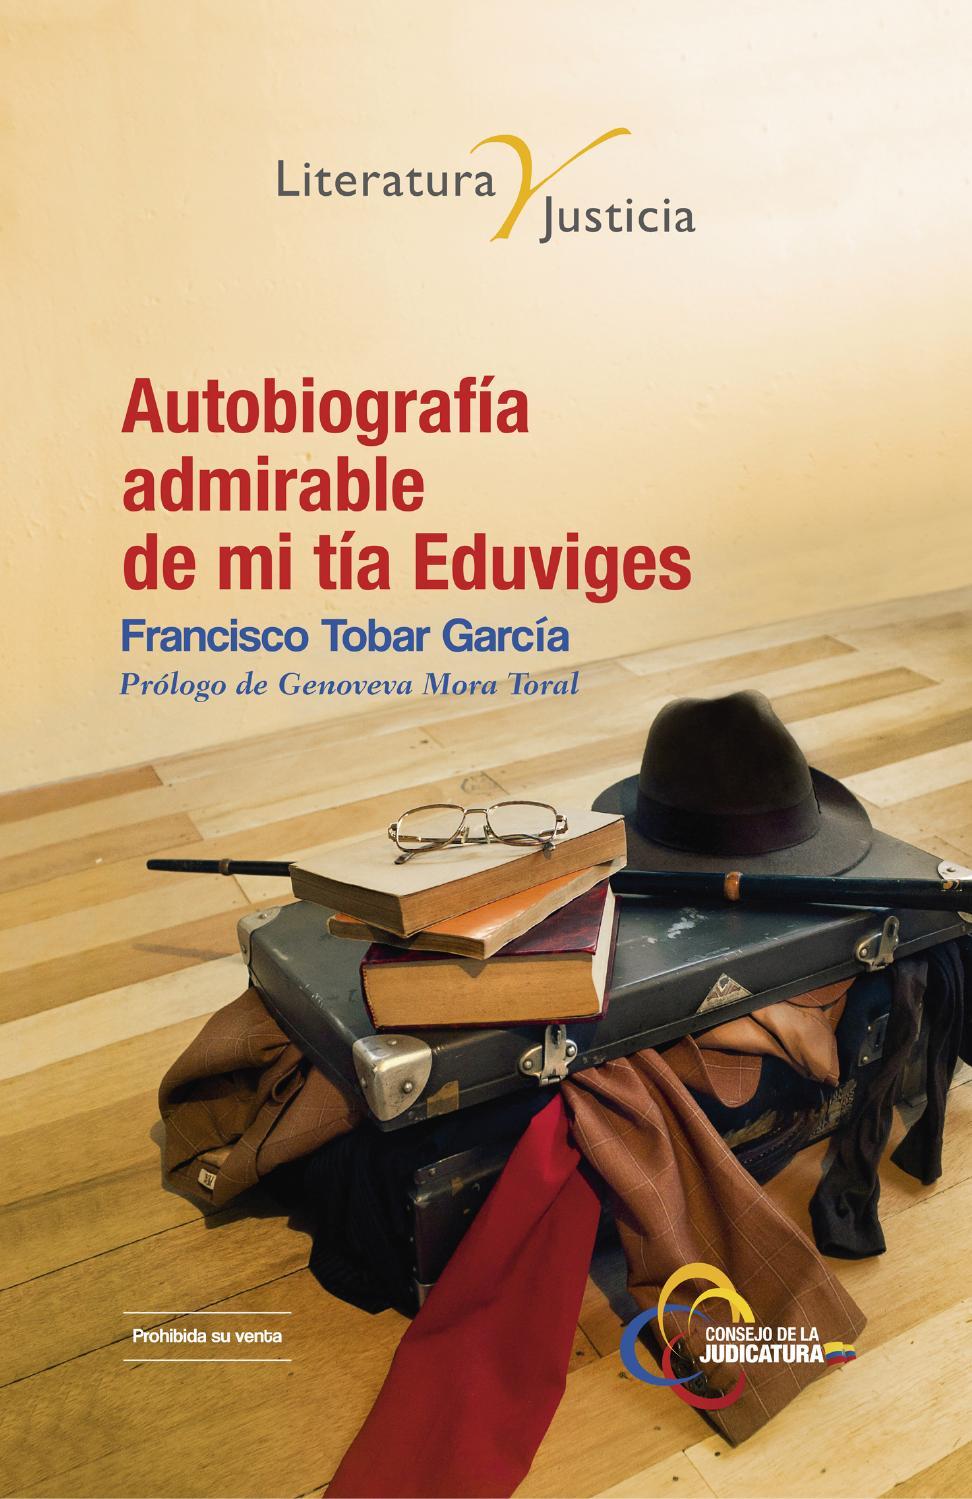 Autobiografia admirable de mi tía Eduviges by Consejo de la ...